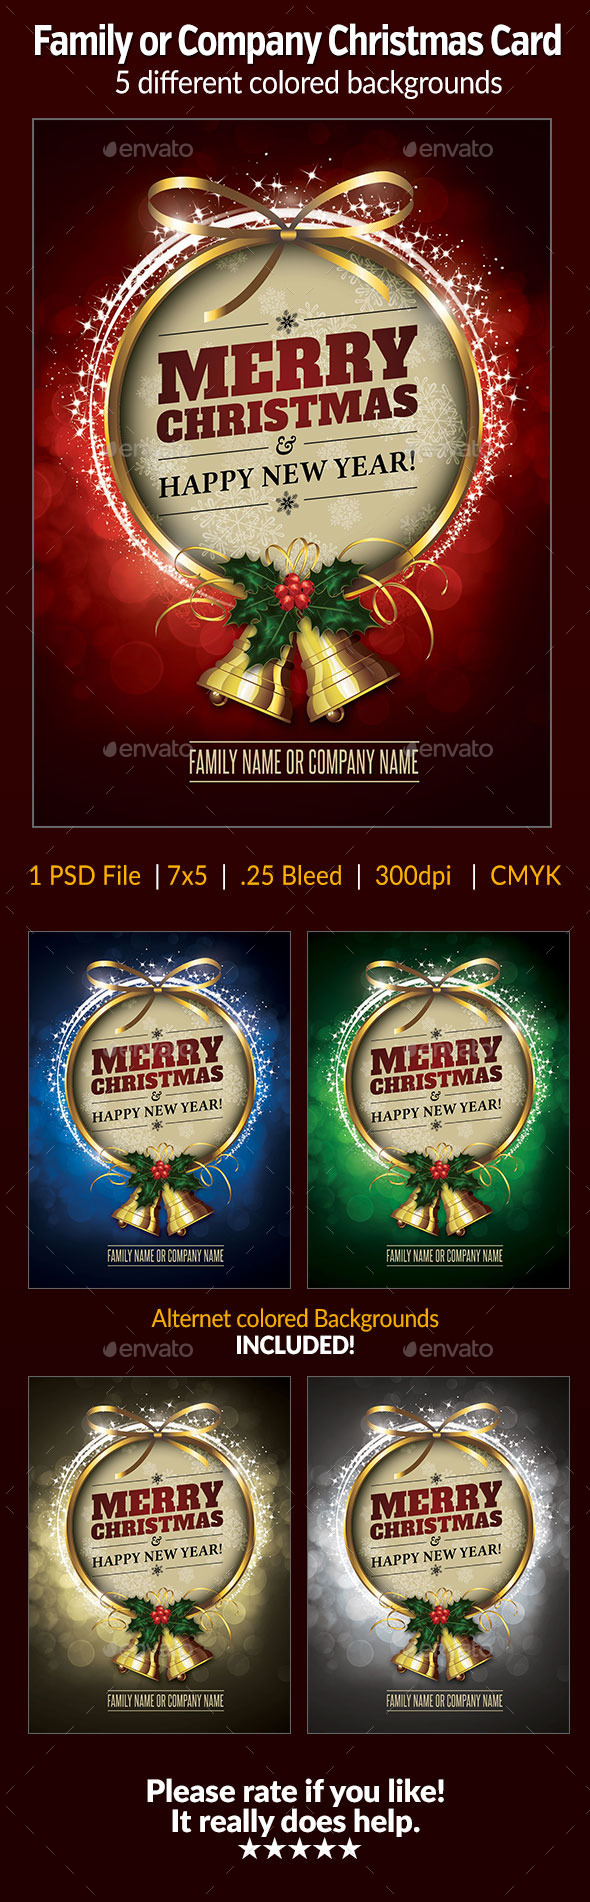 GraphicRiver Family Company Christmas Card 9541834